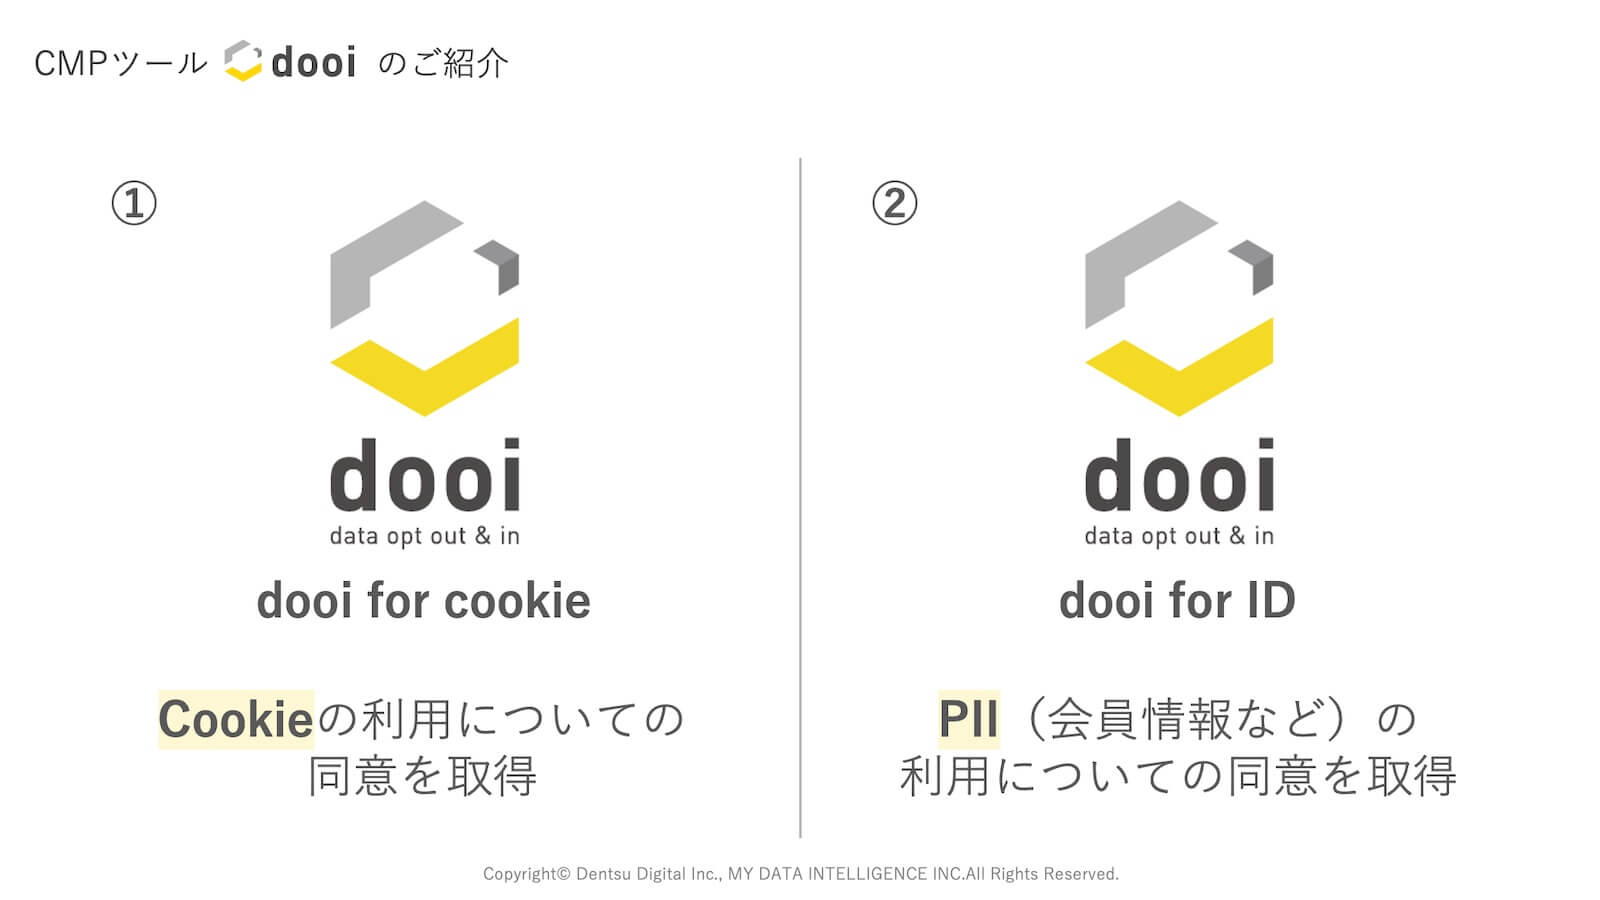 CMPツール「dooi」1